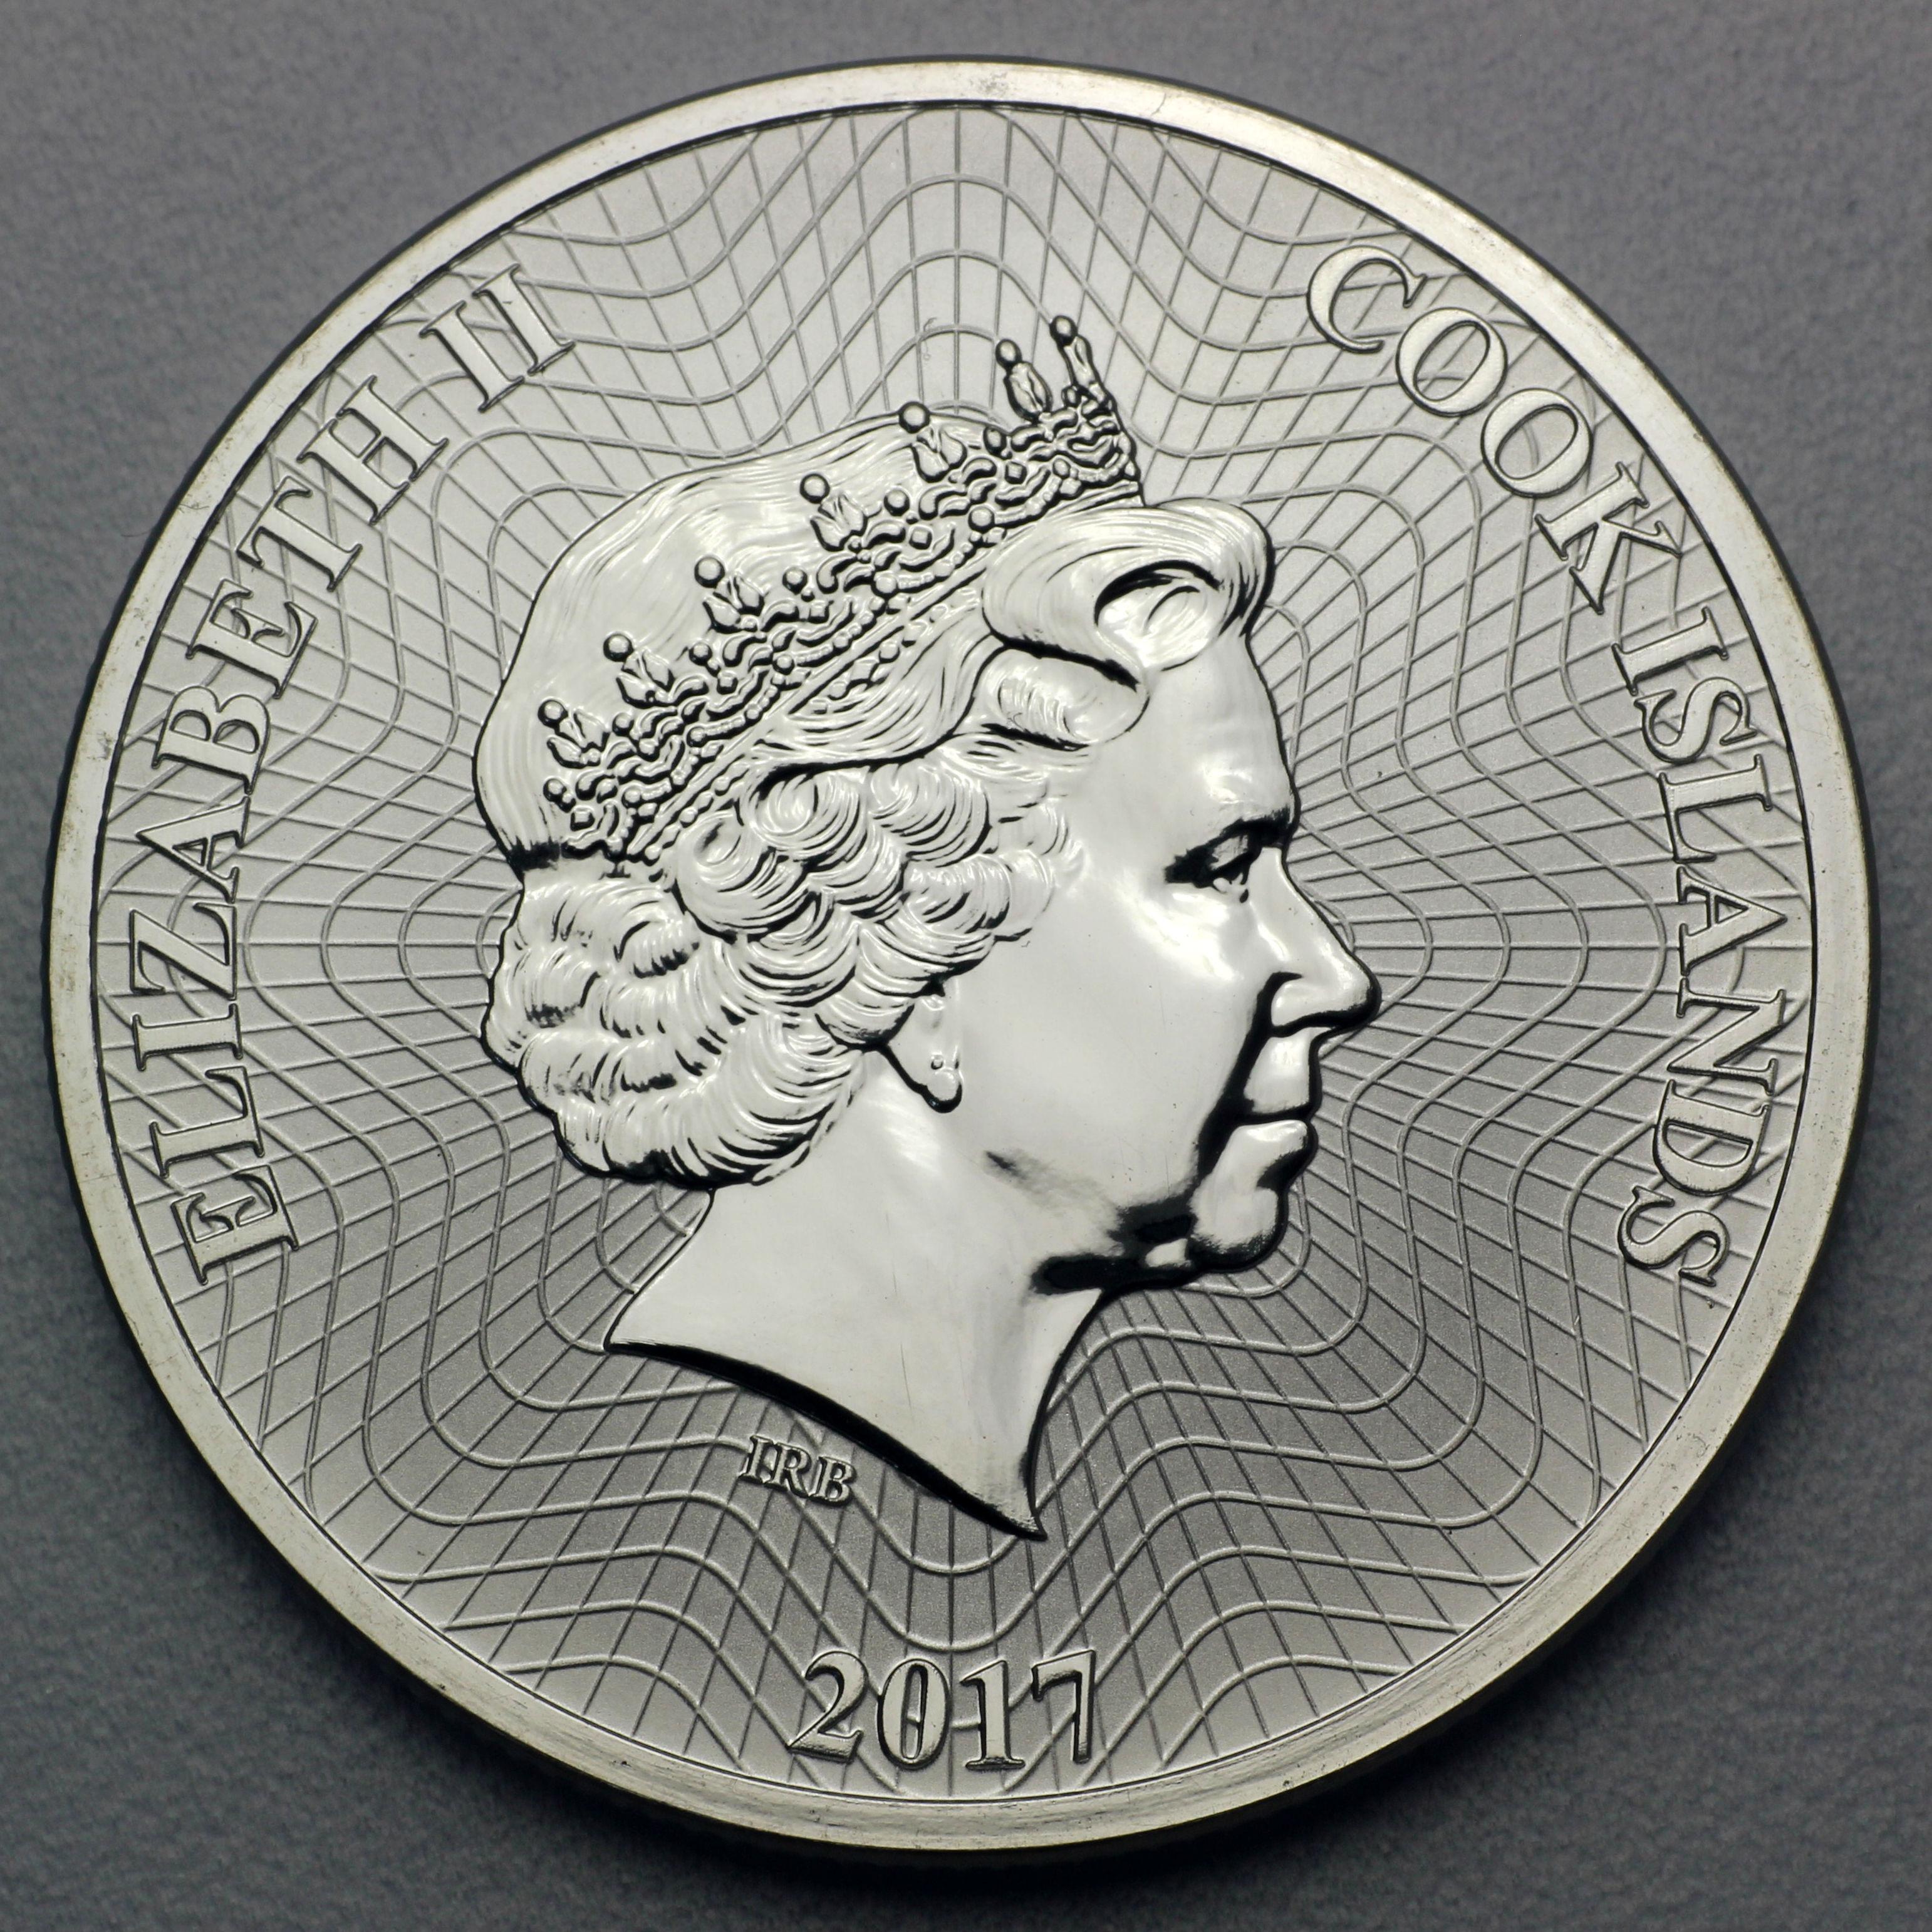 1 oz Cook Islands Silbermünzen Ankaufpreis Wert Infos | ESG